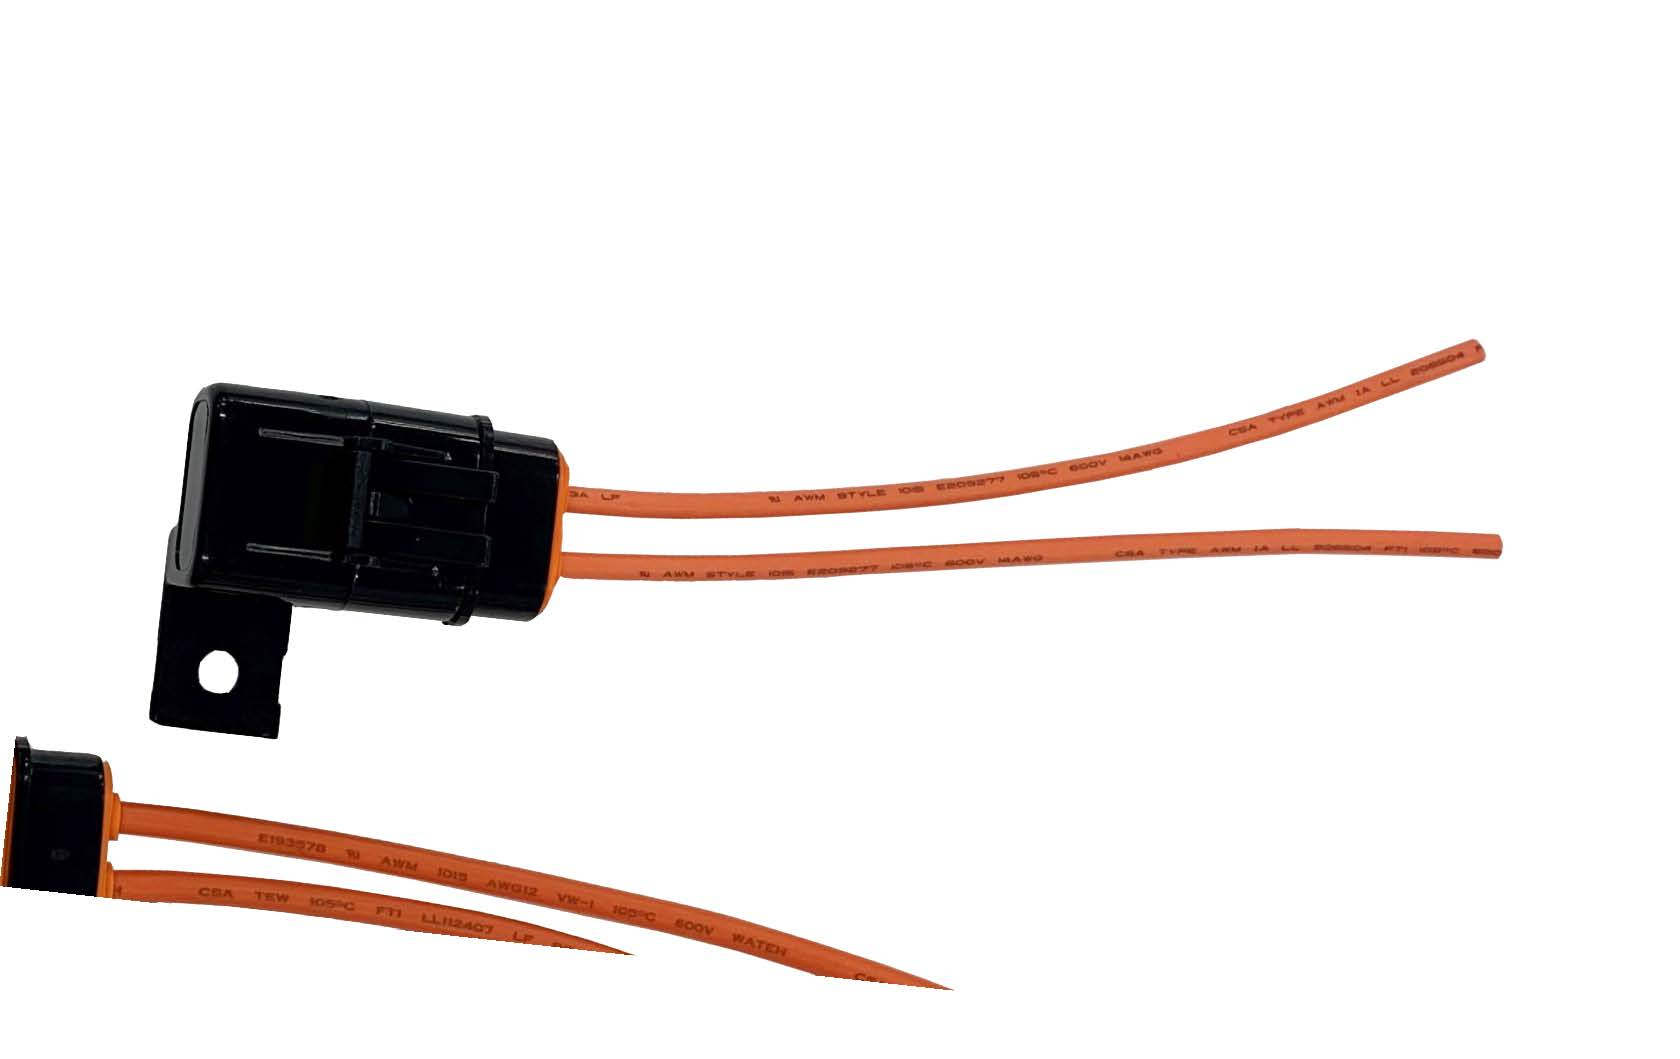 Fuse Holder - 14 ga Mini Waterproof 20 amp